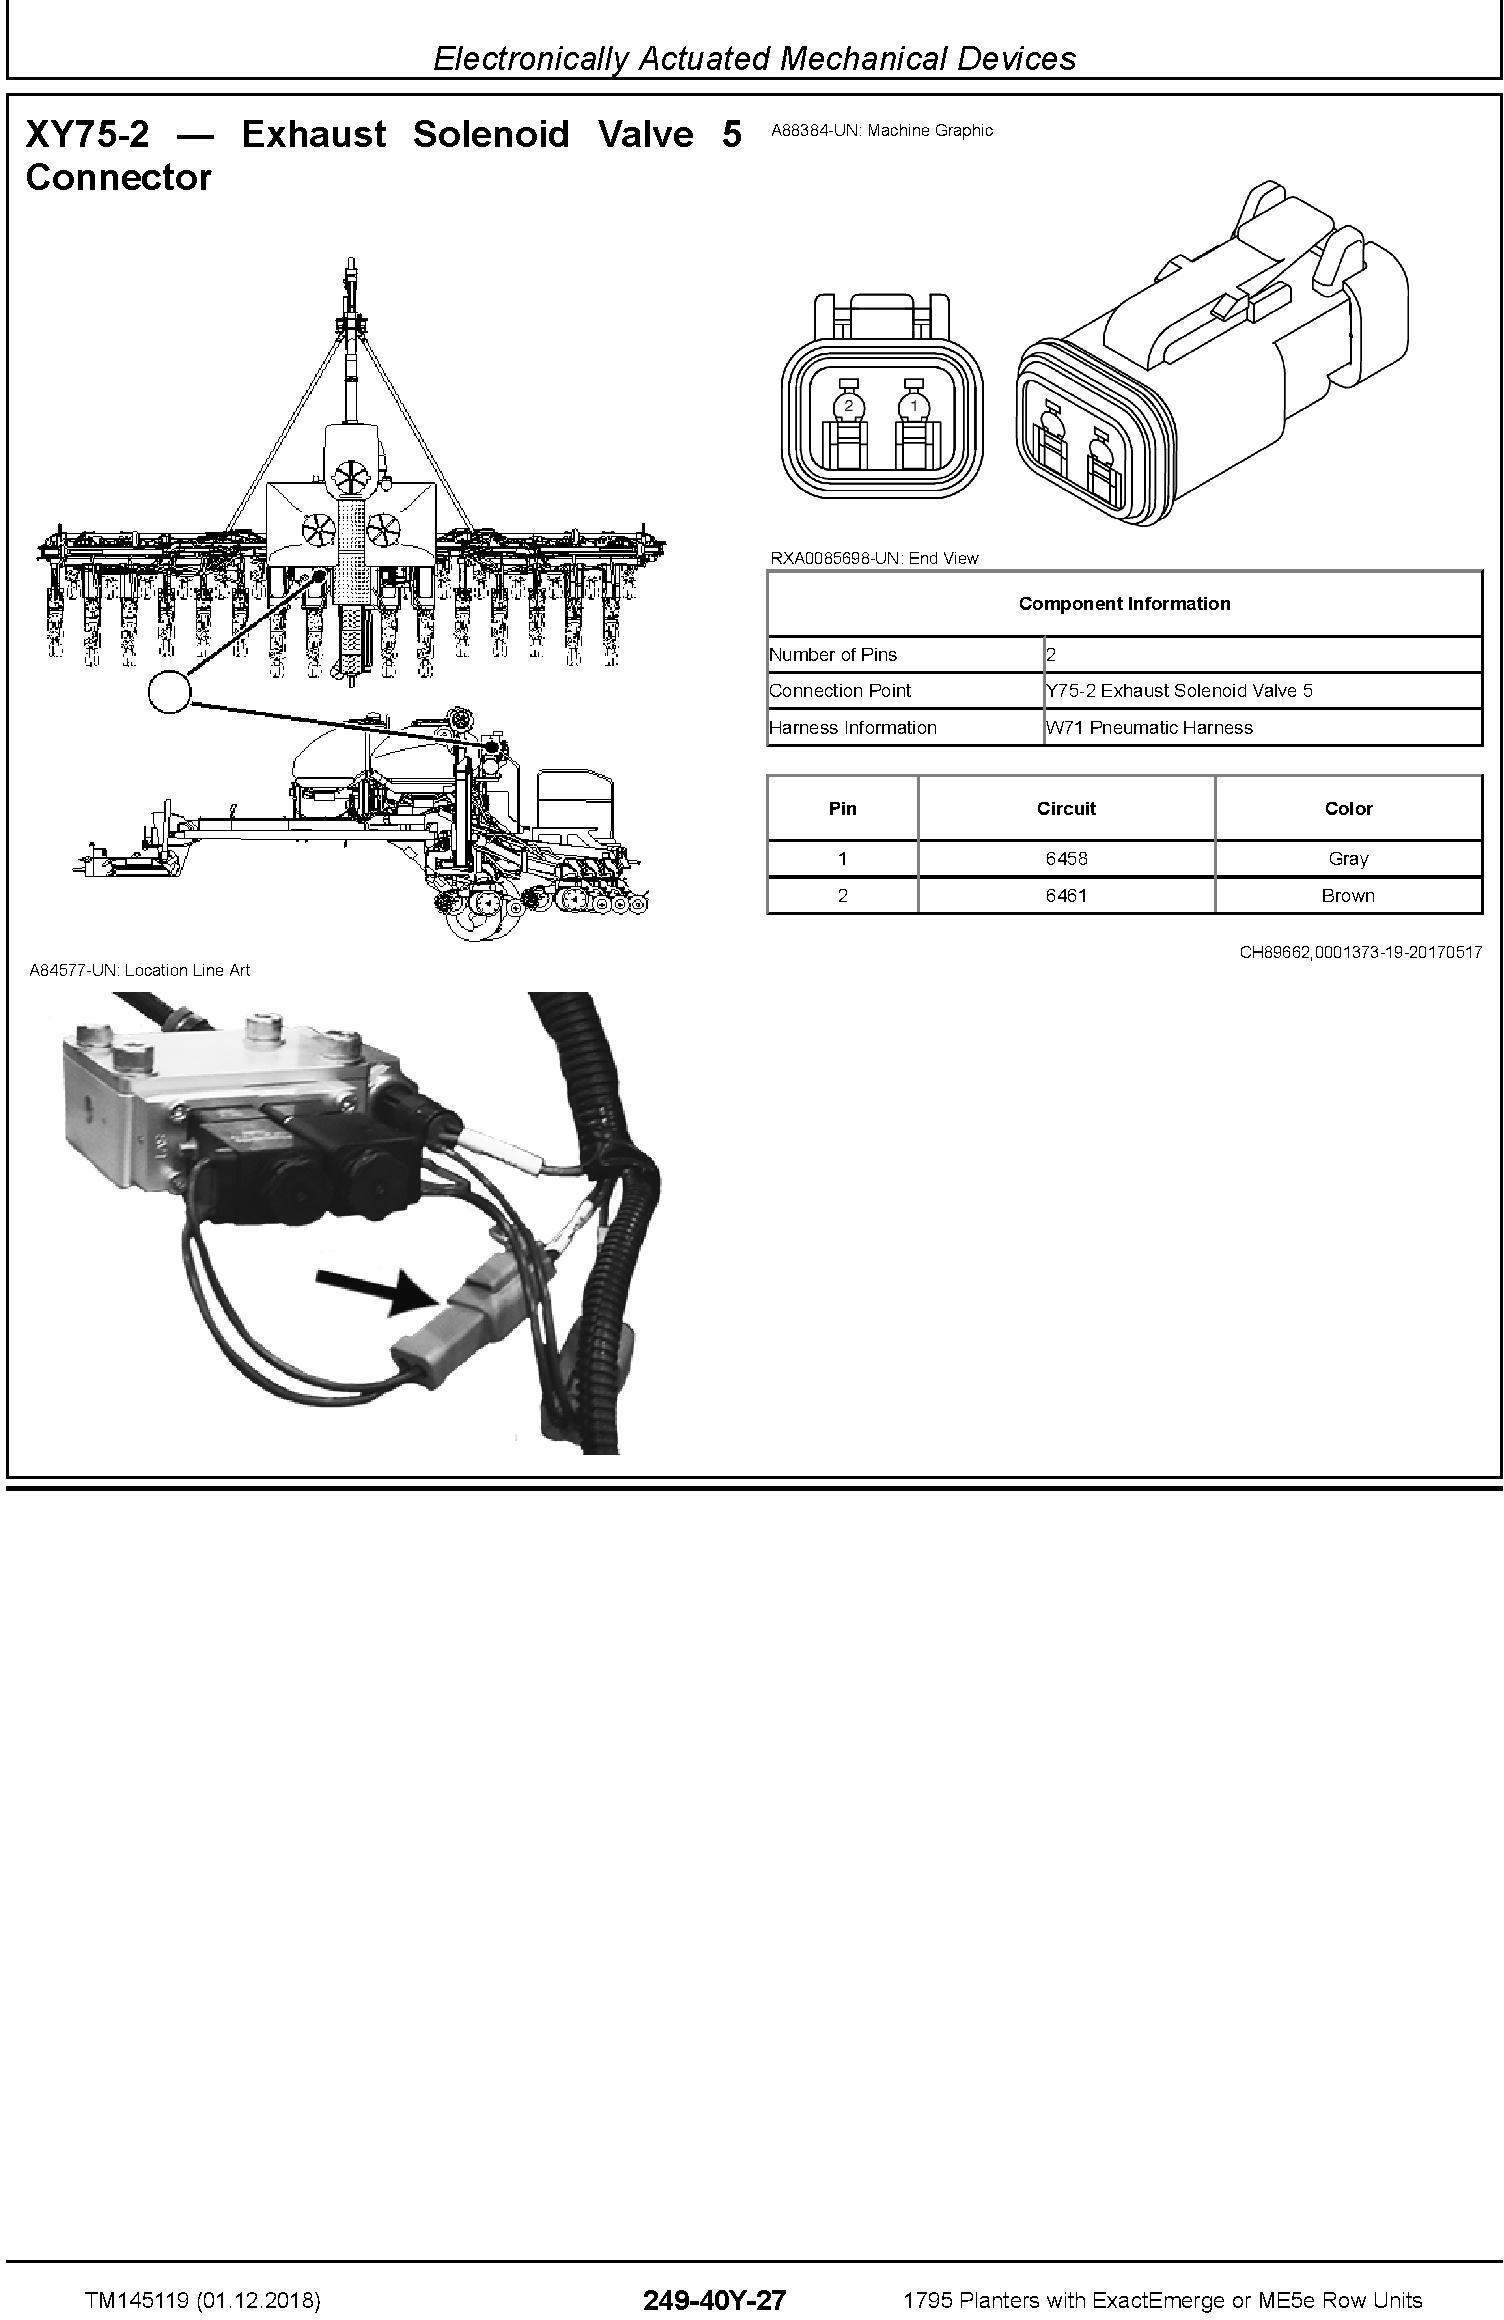 John Deere 1795 Planters with ExactEmerge or ME5e Row Units Diagnostic Technical Manual (TM145119) - 2